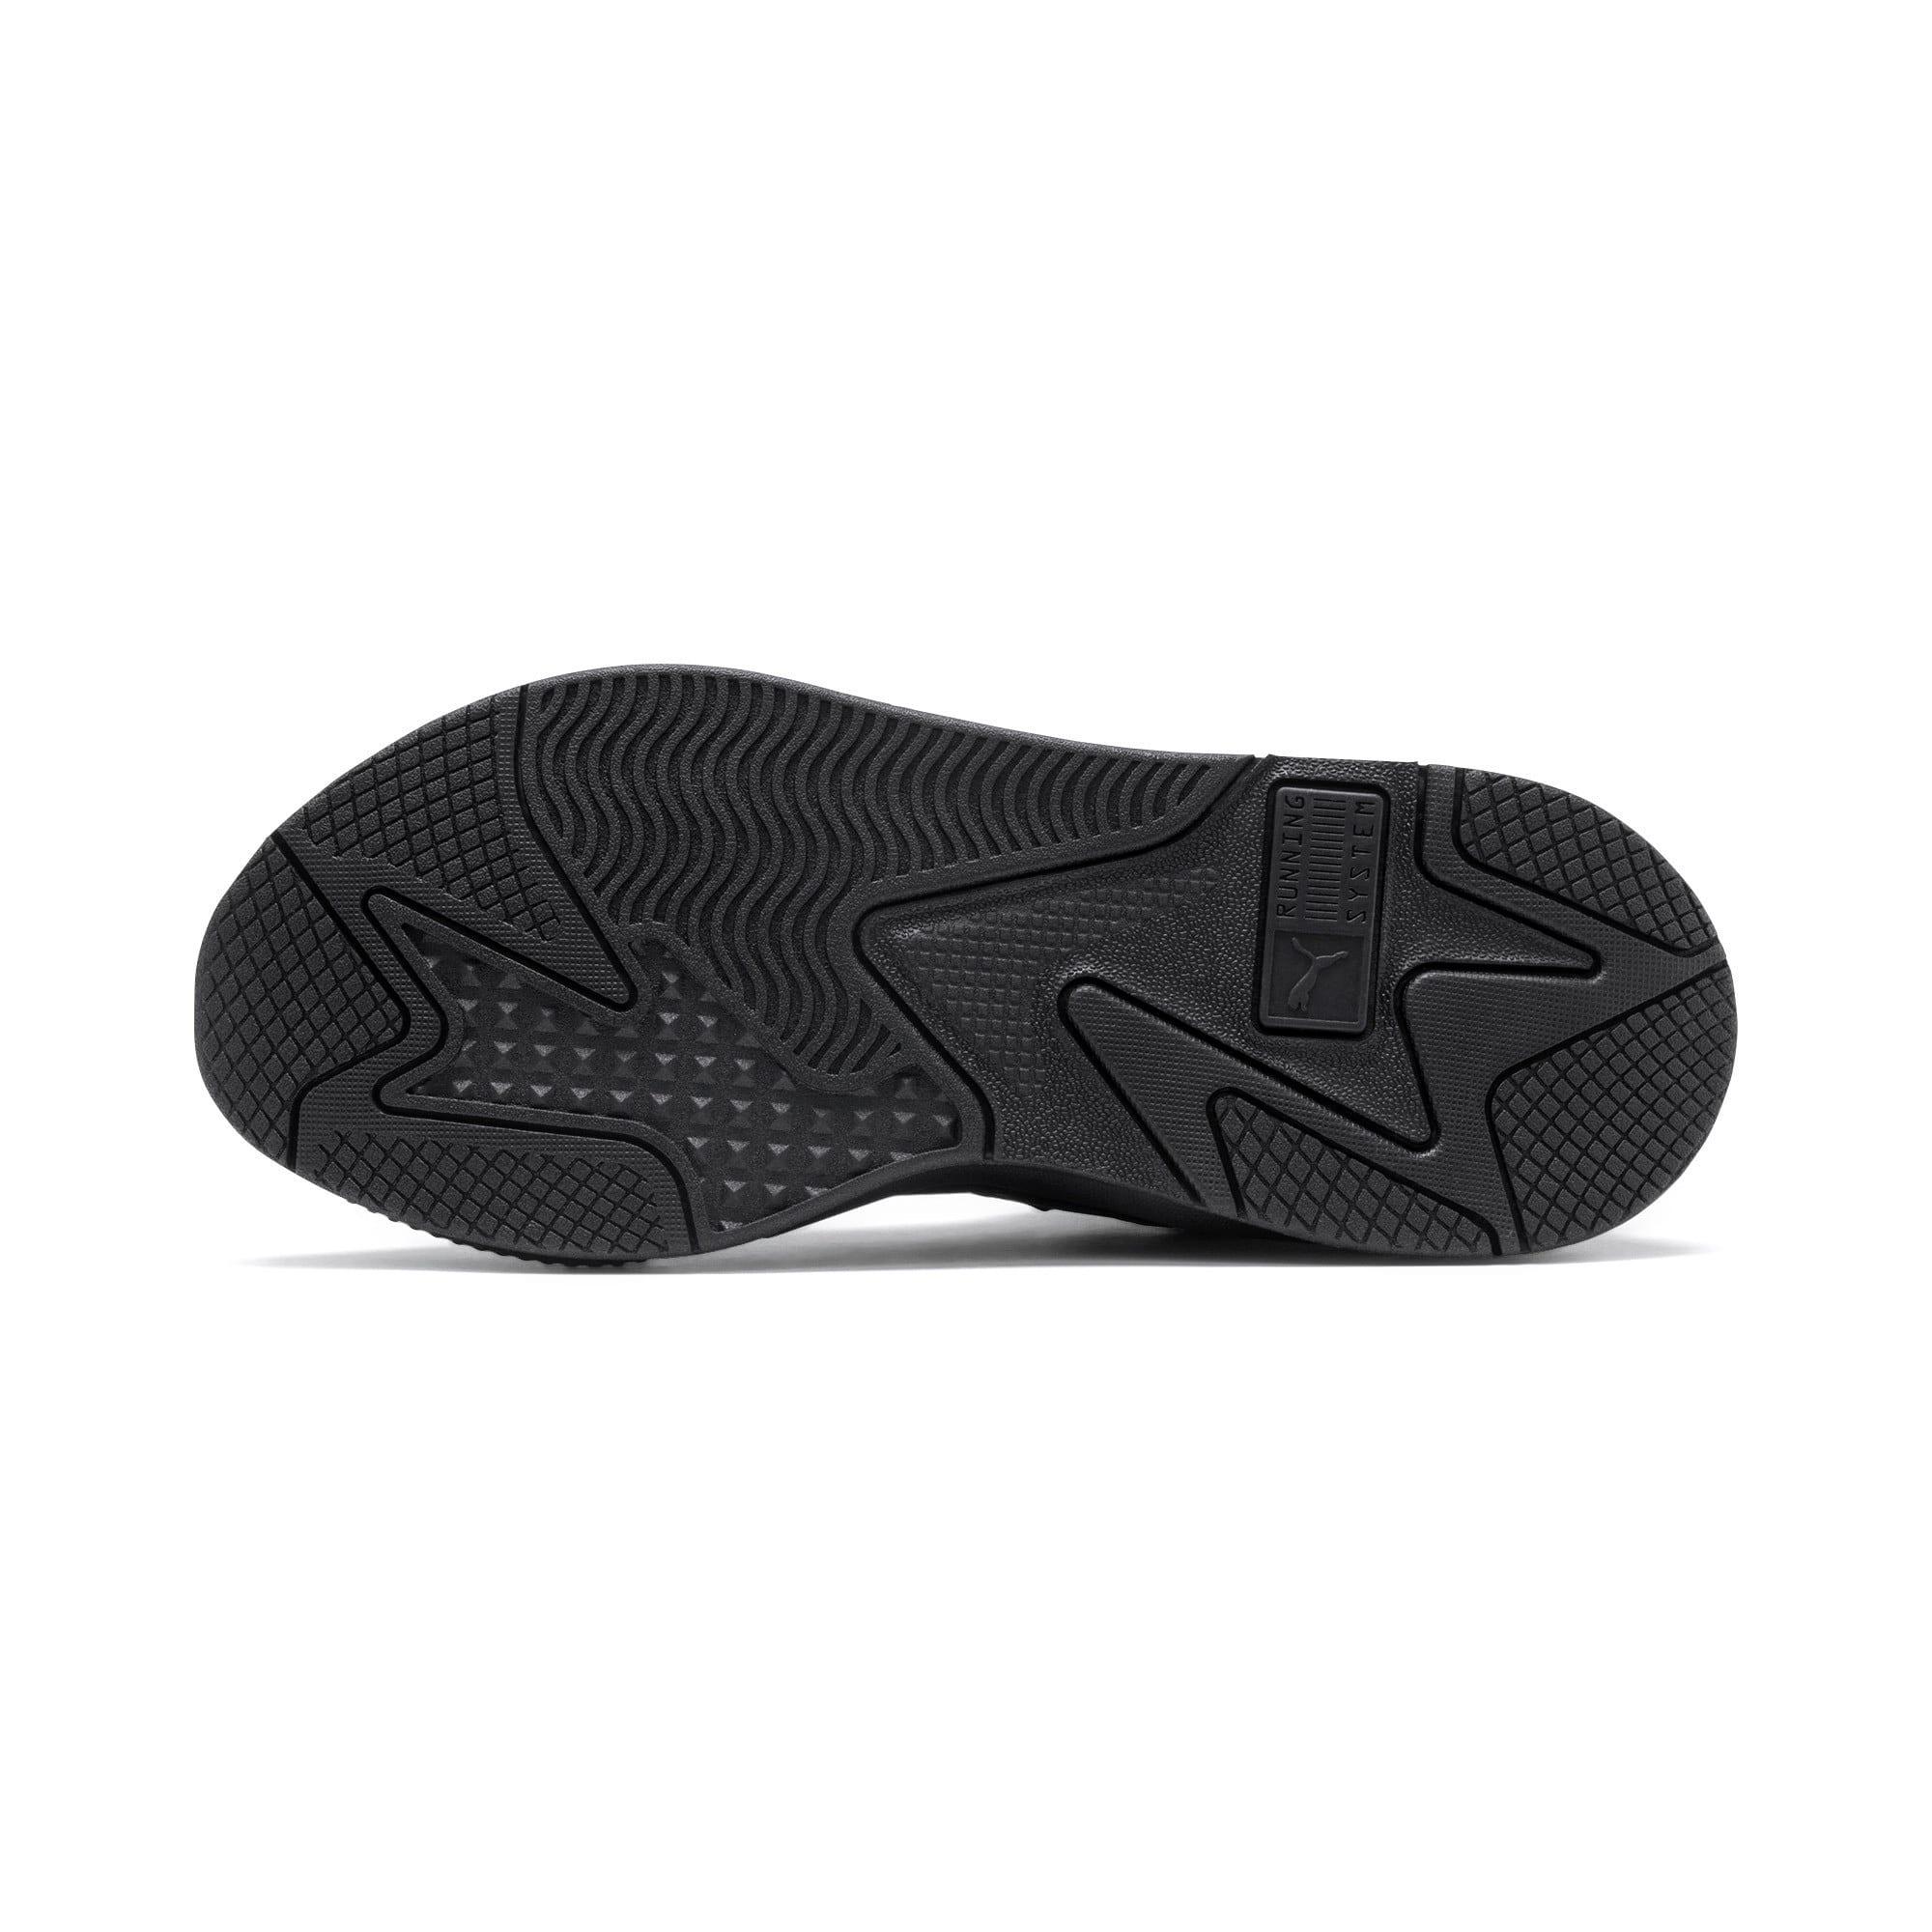 Thumbnail 4 of RS-X Sneaker, Puma Black-Puma Black, medium